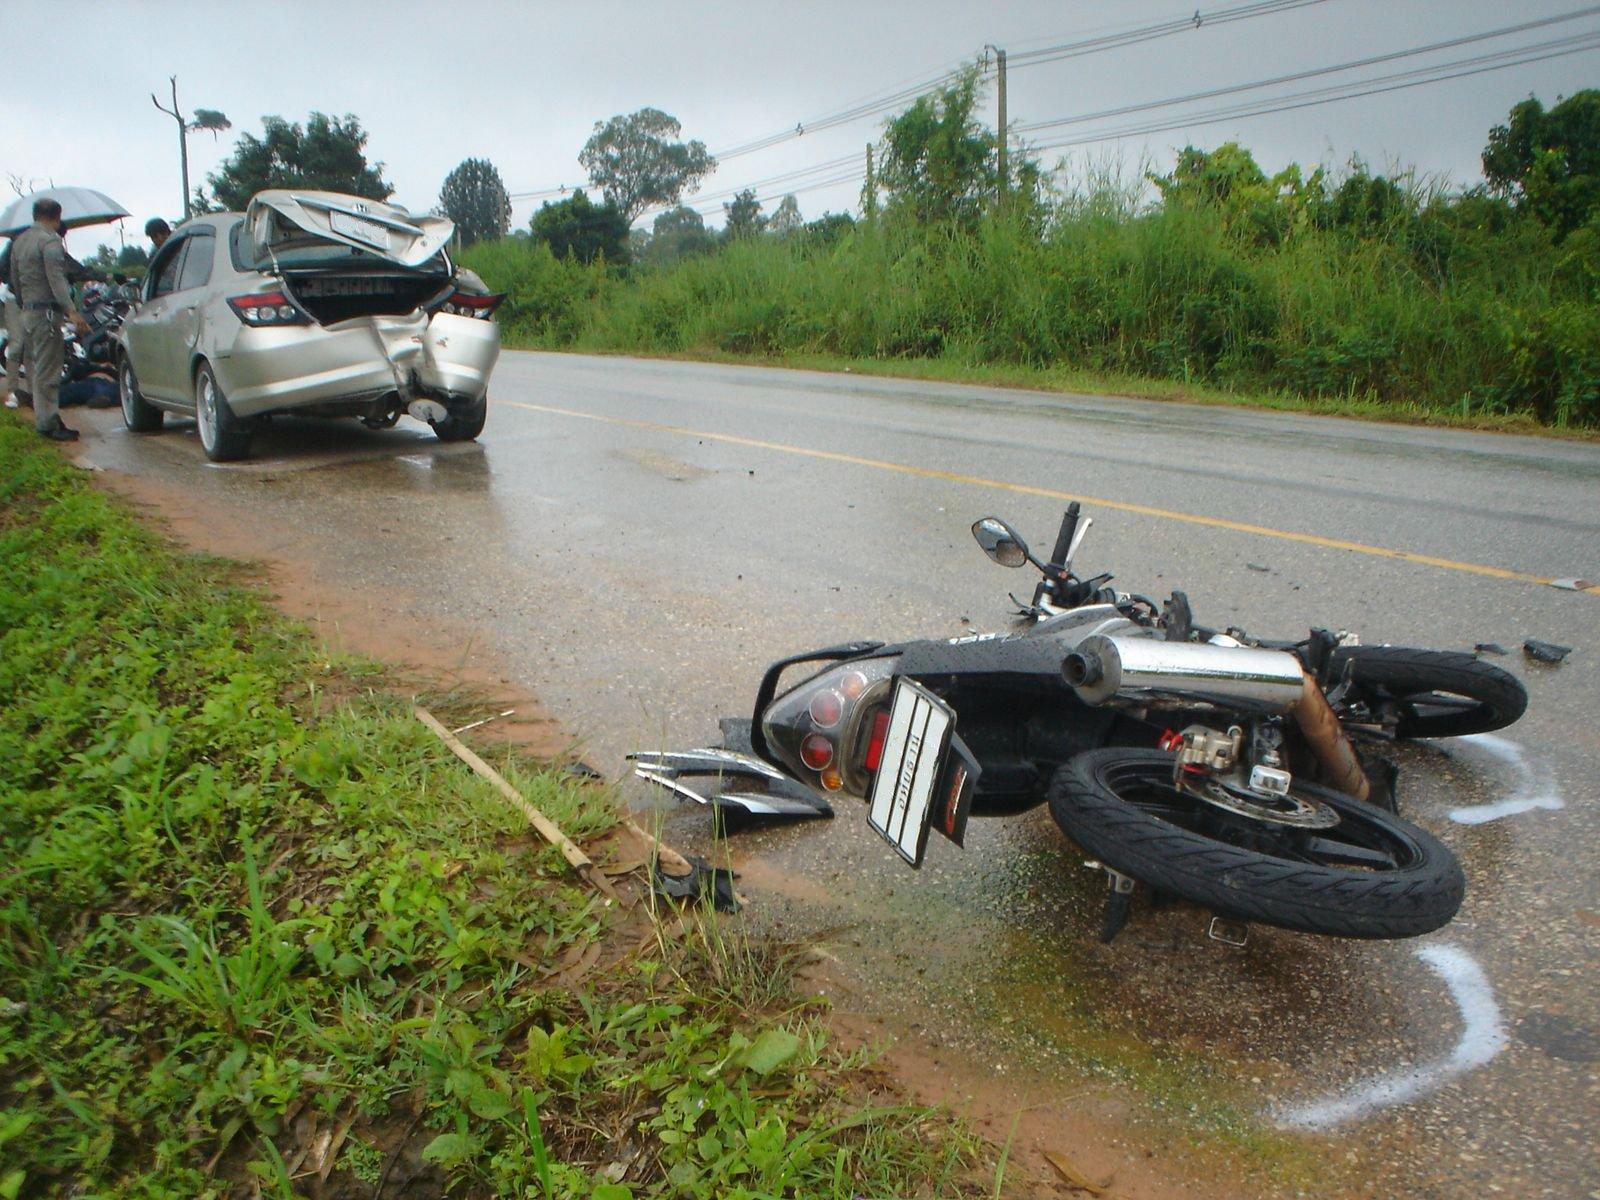 Techie killed In bike accident | Deccan Herald